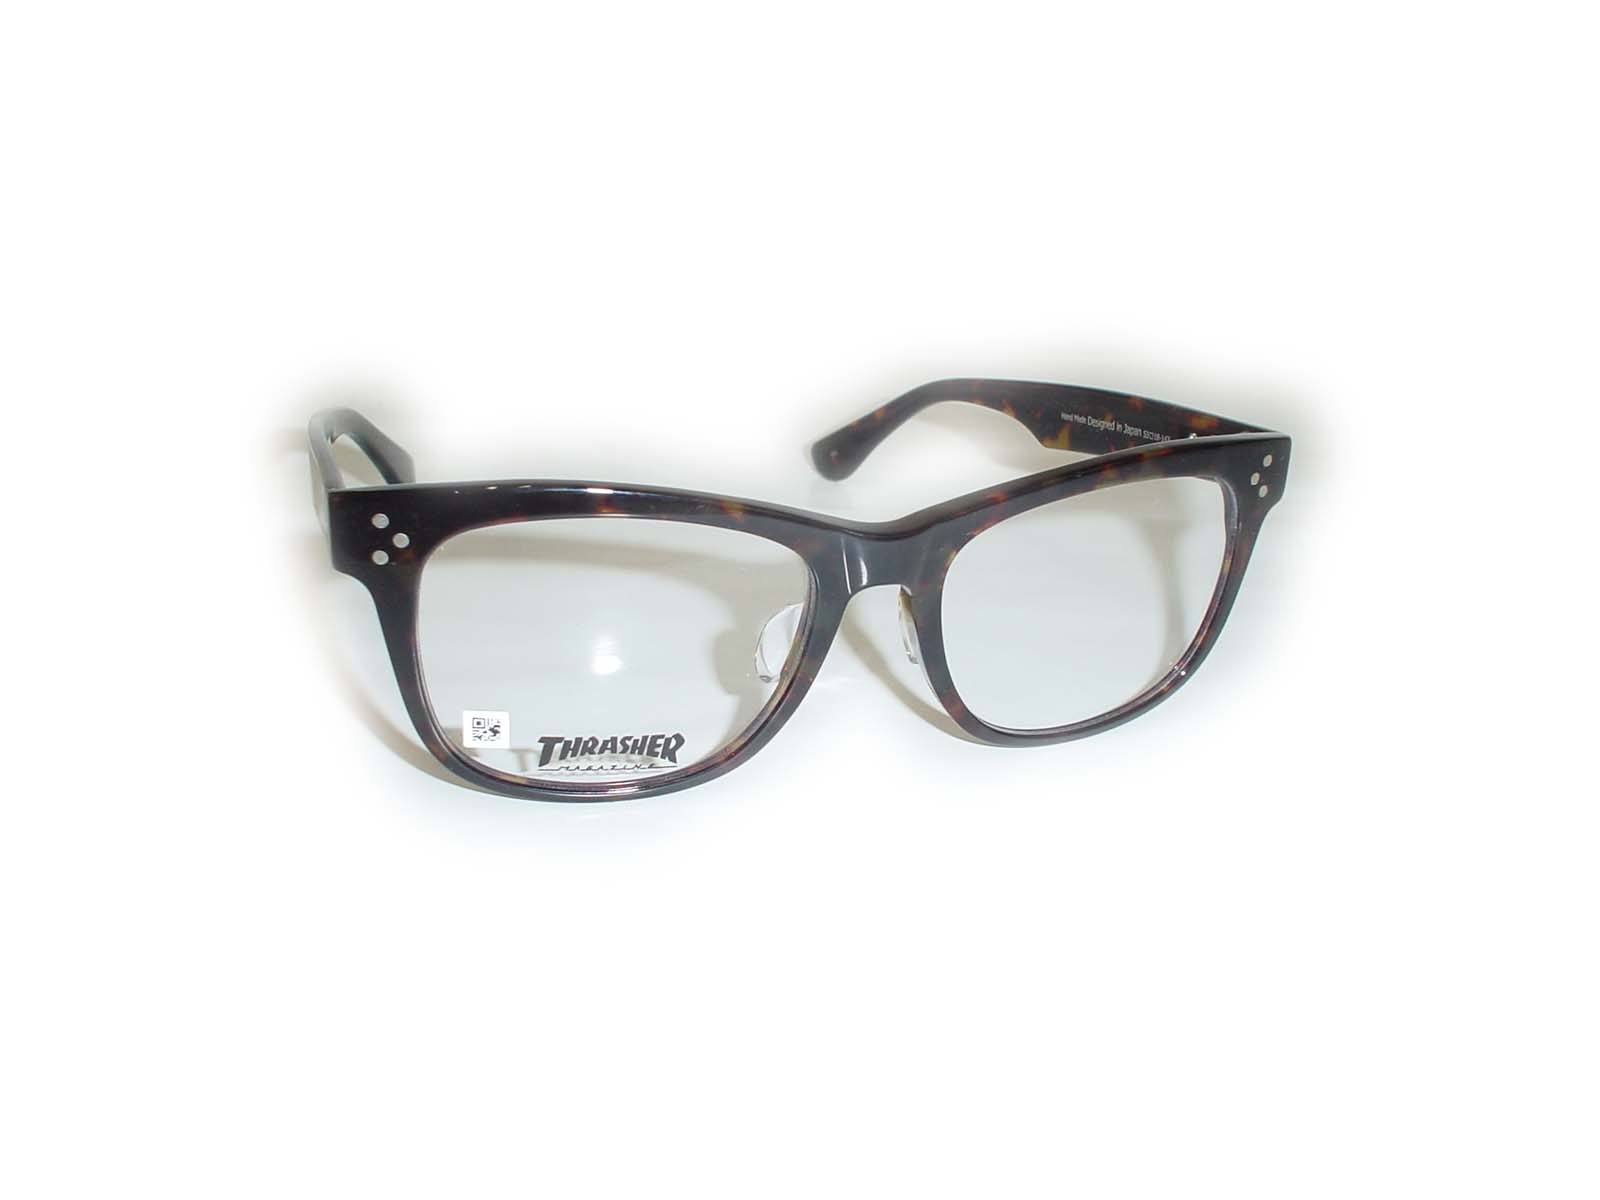 ★THRASHER(スラッシャー)★80353□18-143COL.デミブラウンHV超薄型非球面レンズ付